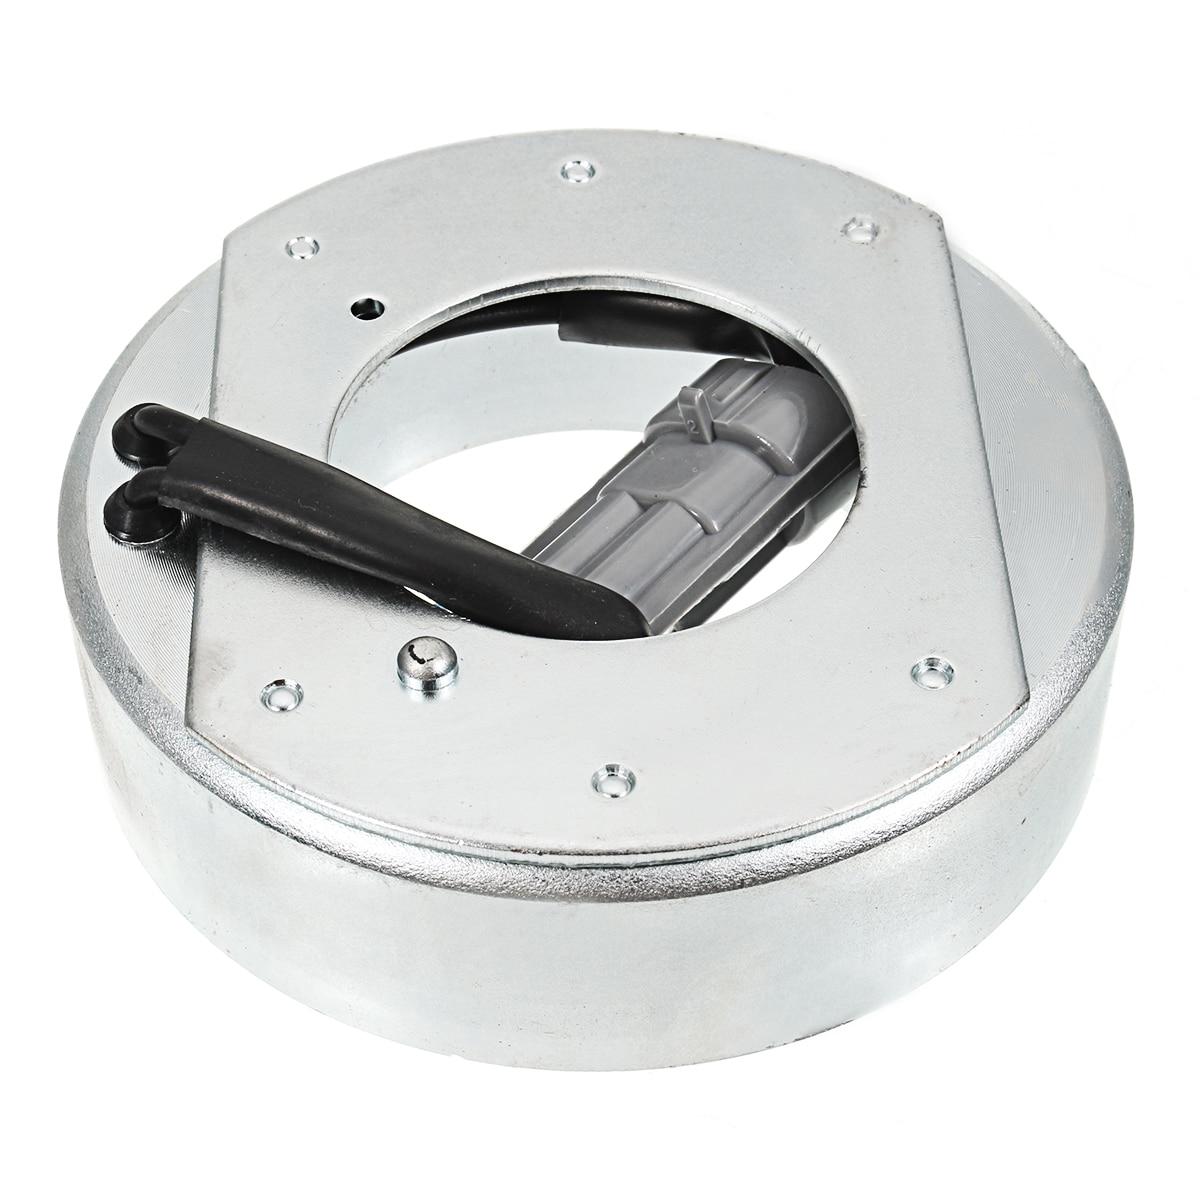 12V Car AC Compressor Magnetic Clutch Coil Air conditioning for CVC Opel Astra Zafira Meriva /Delphi R134a12V Car AC Compressor Magnetic Clutch Coil Air conditioning for CVC Opel Astra Zafira Meriva /Delphi R134a